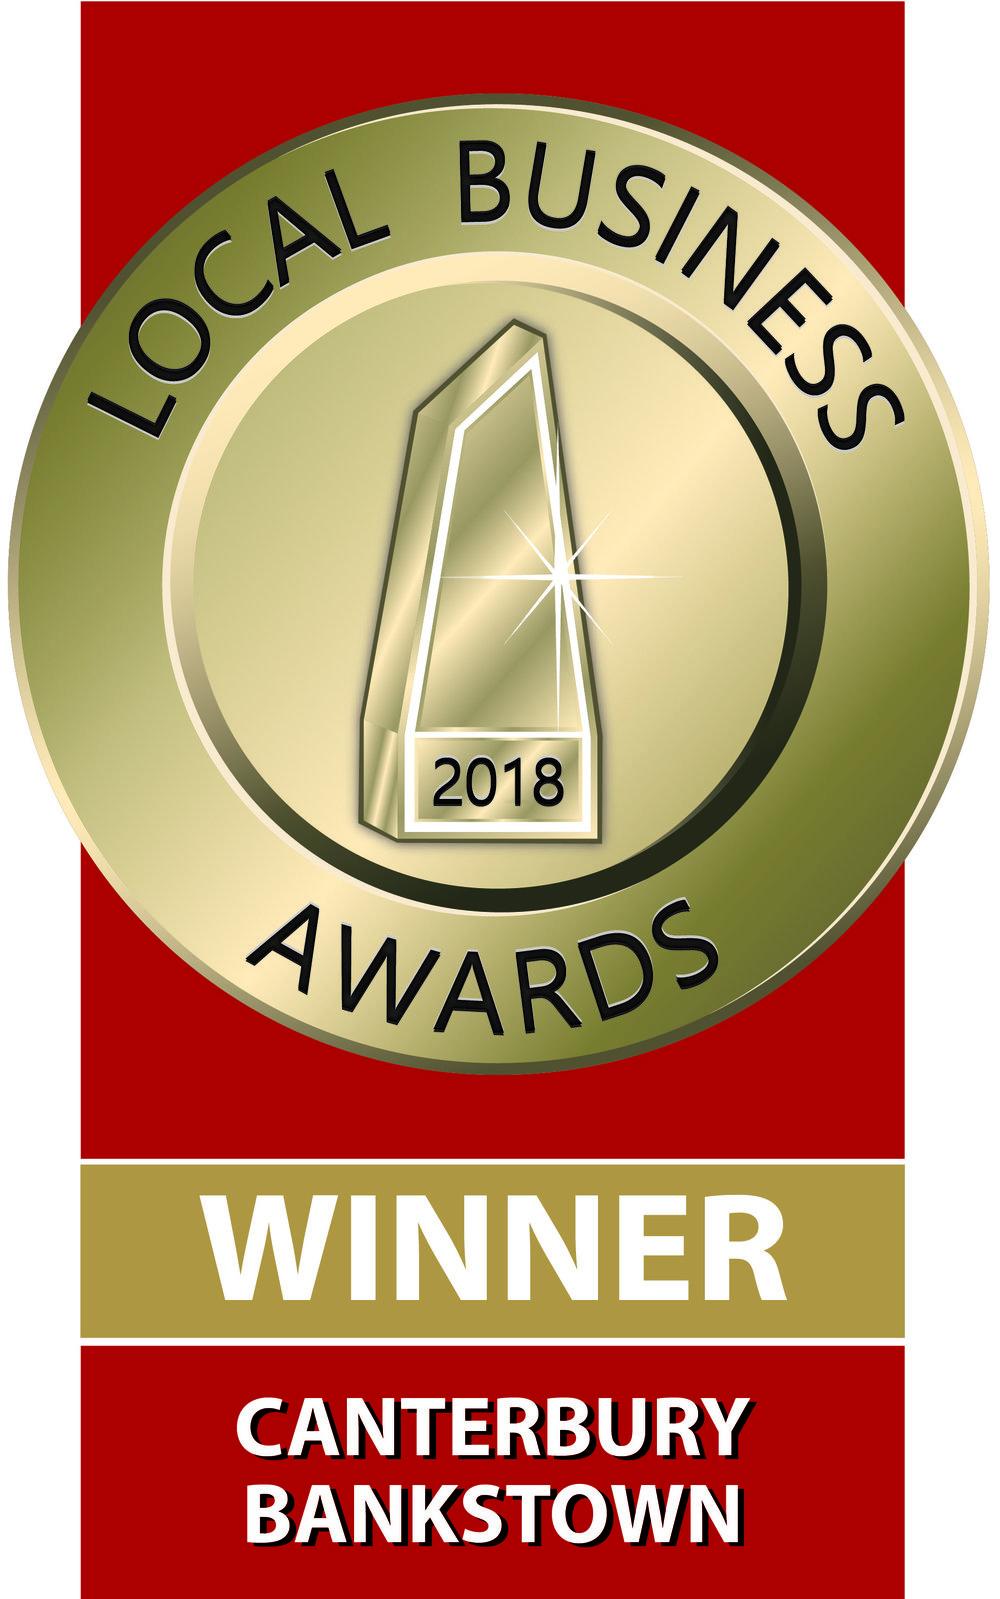 2018 canterbury bankstown winners